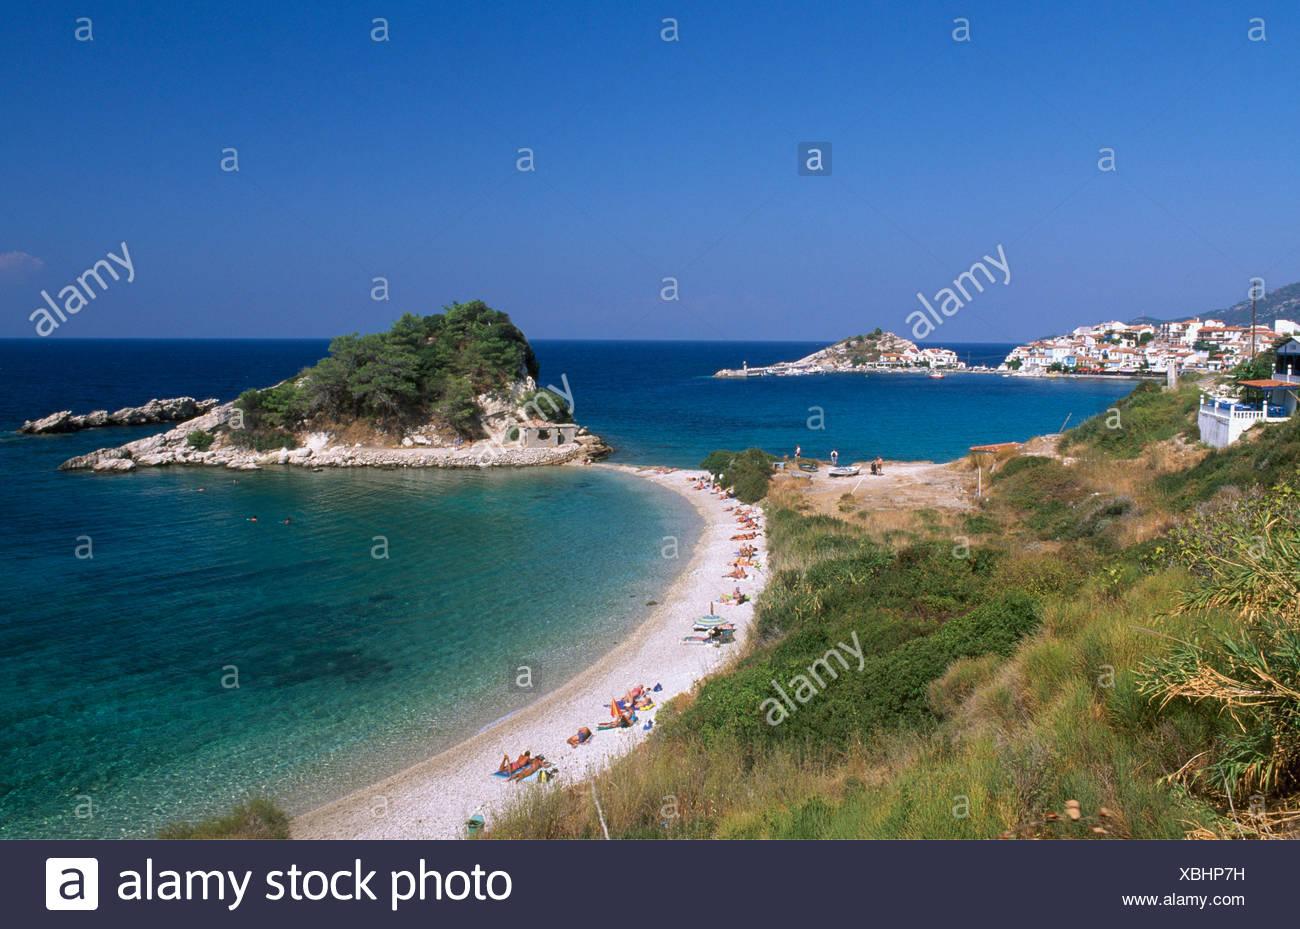 Kokkari Beach, Samos Island, Greece, Europe - Stock Image